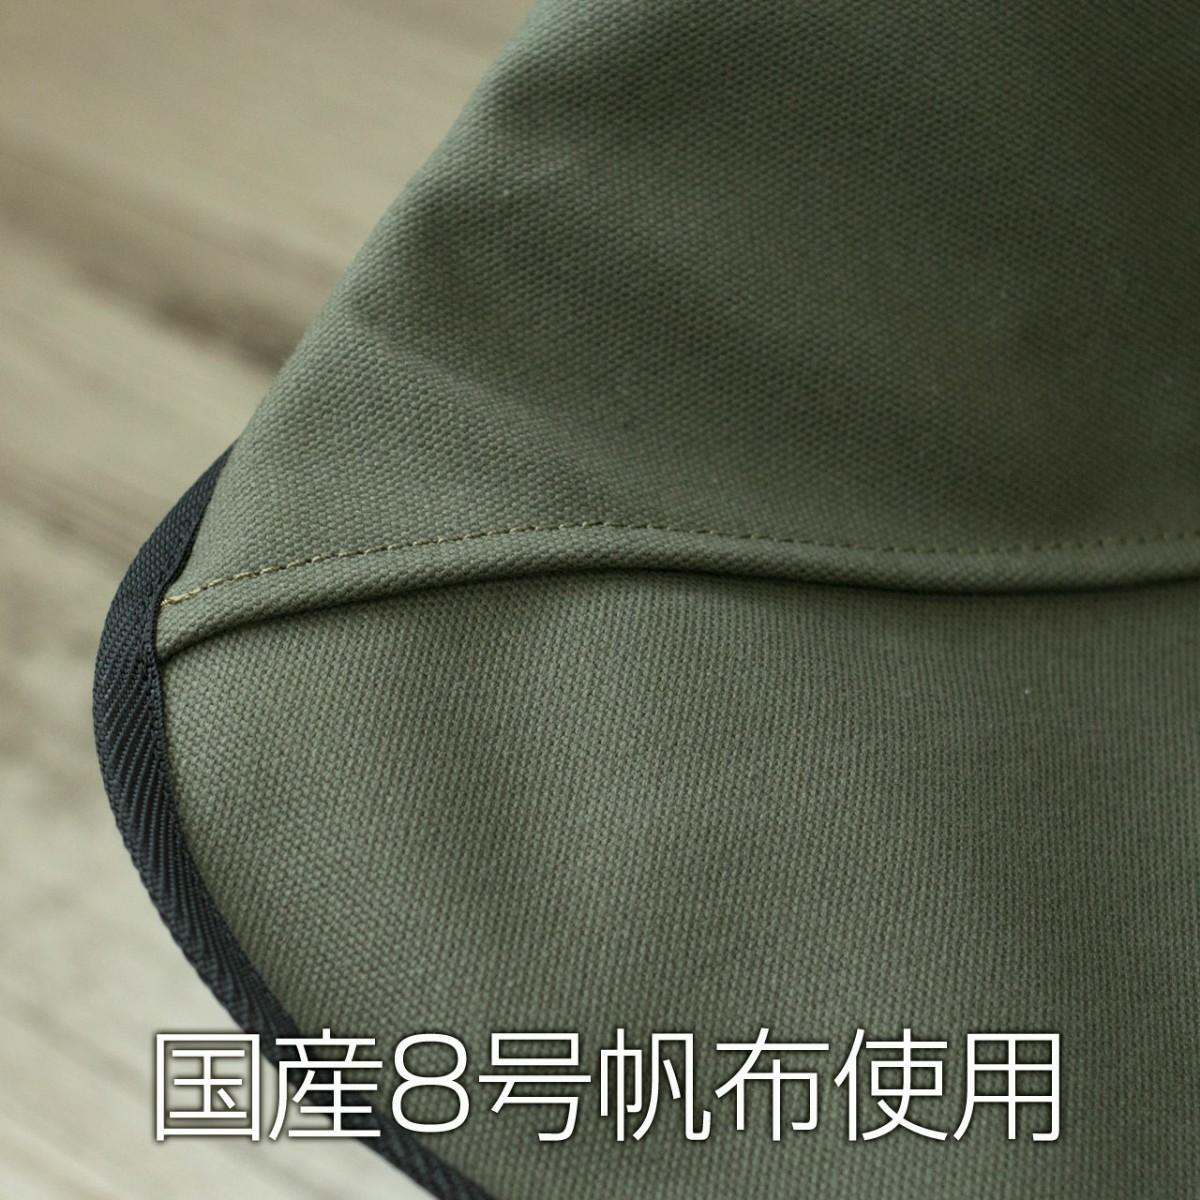 Helinox ヘリノックス チェアワン系専用カバー(8号帆布・焚き火対応)OL